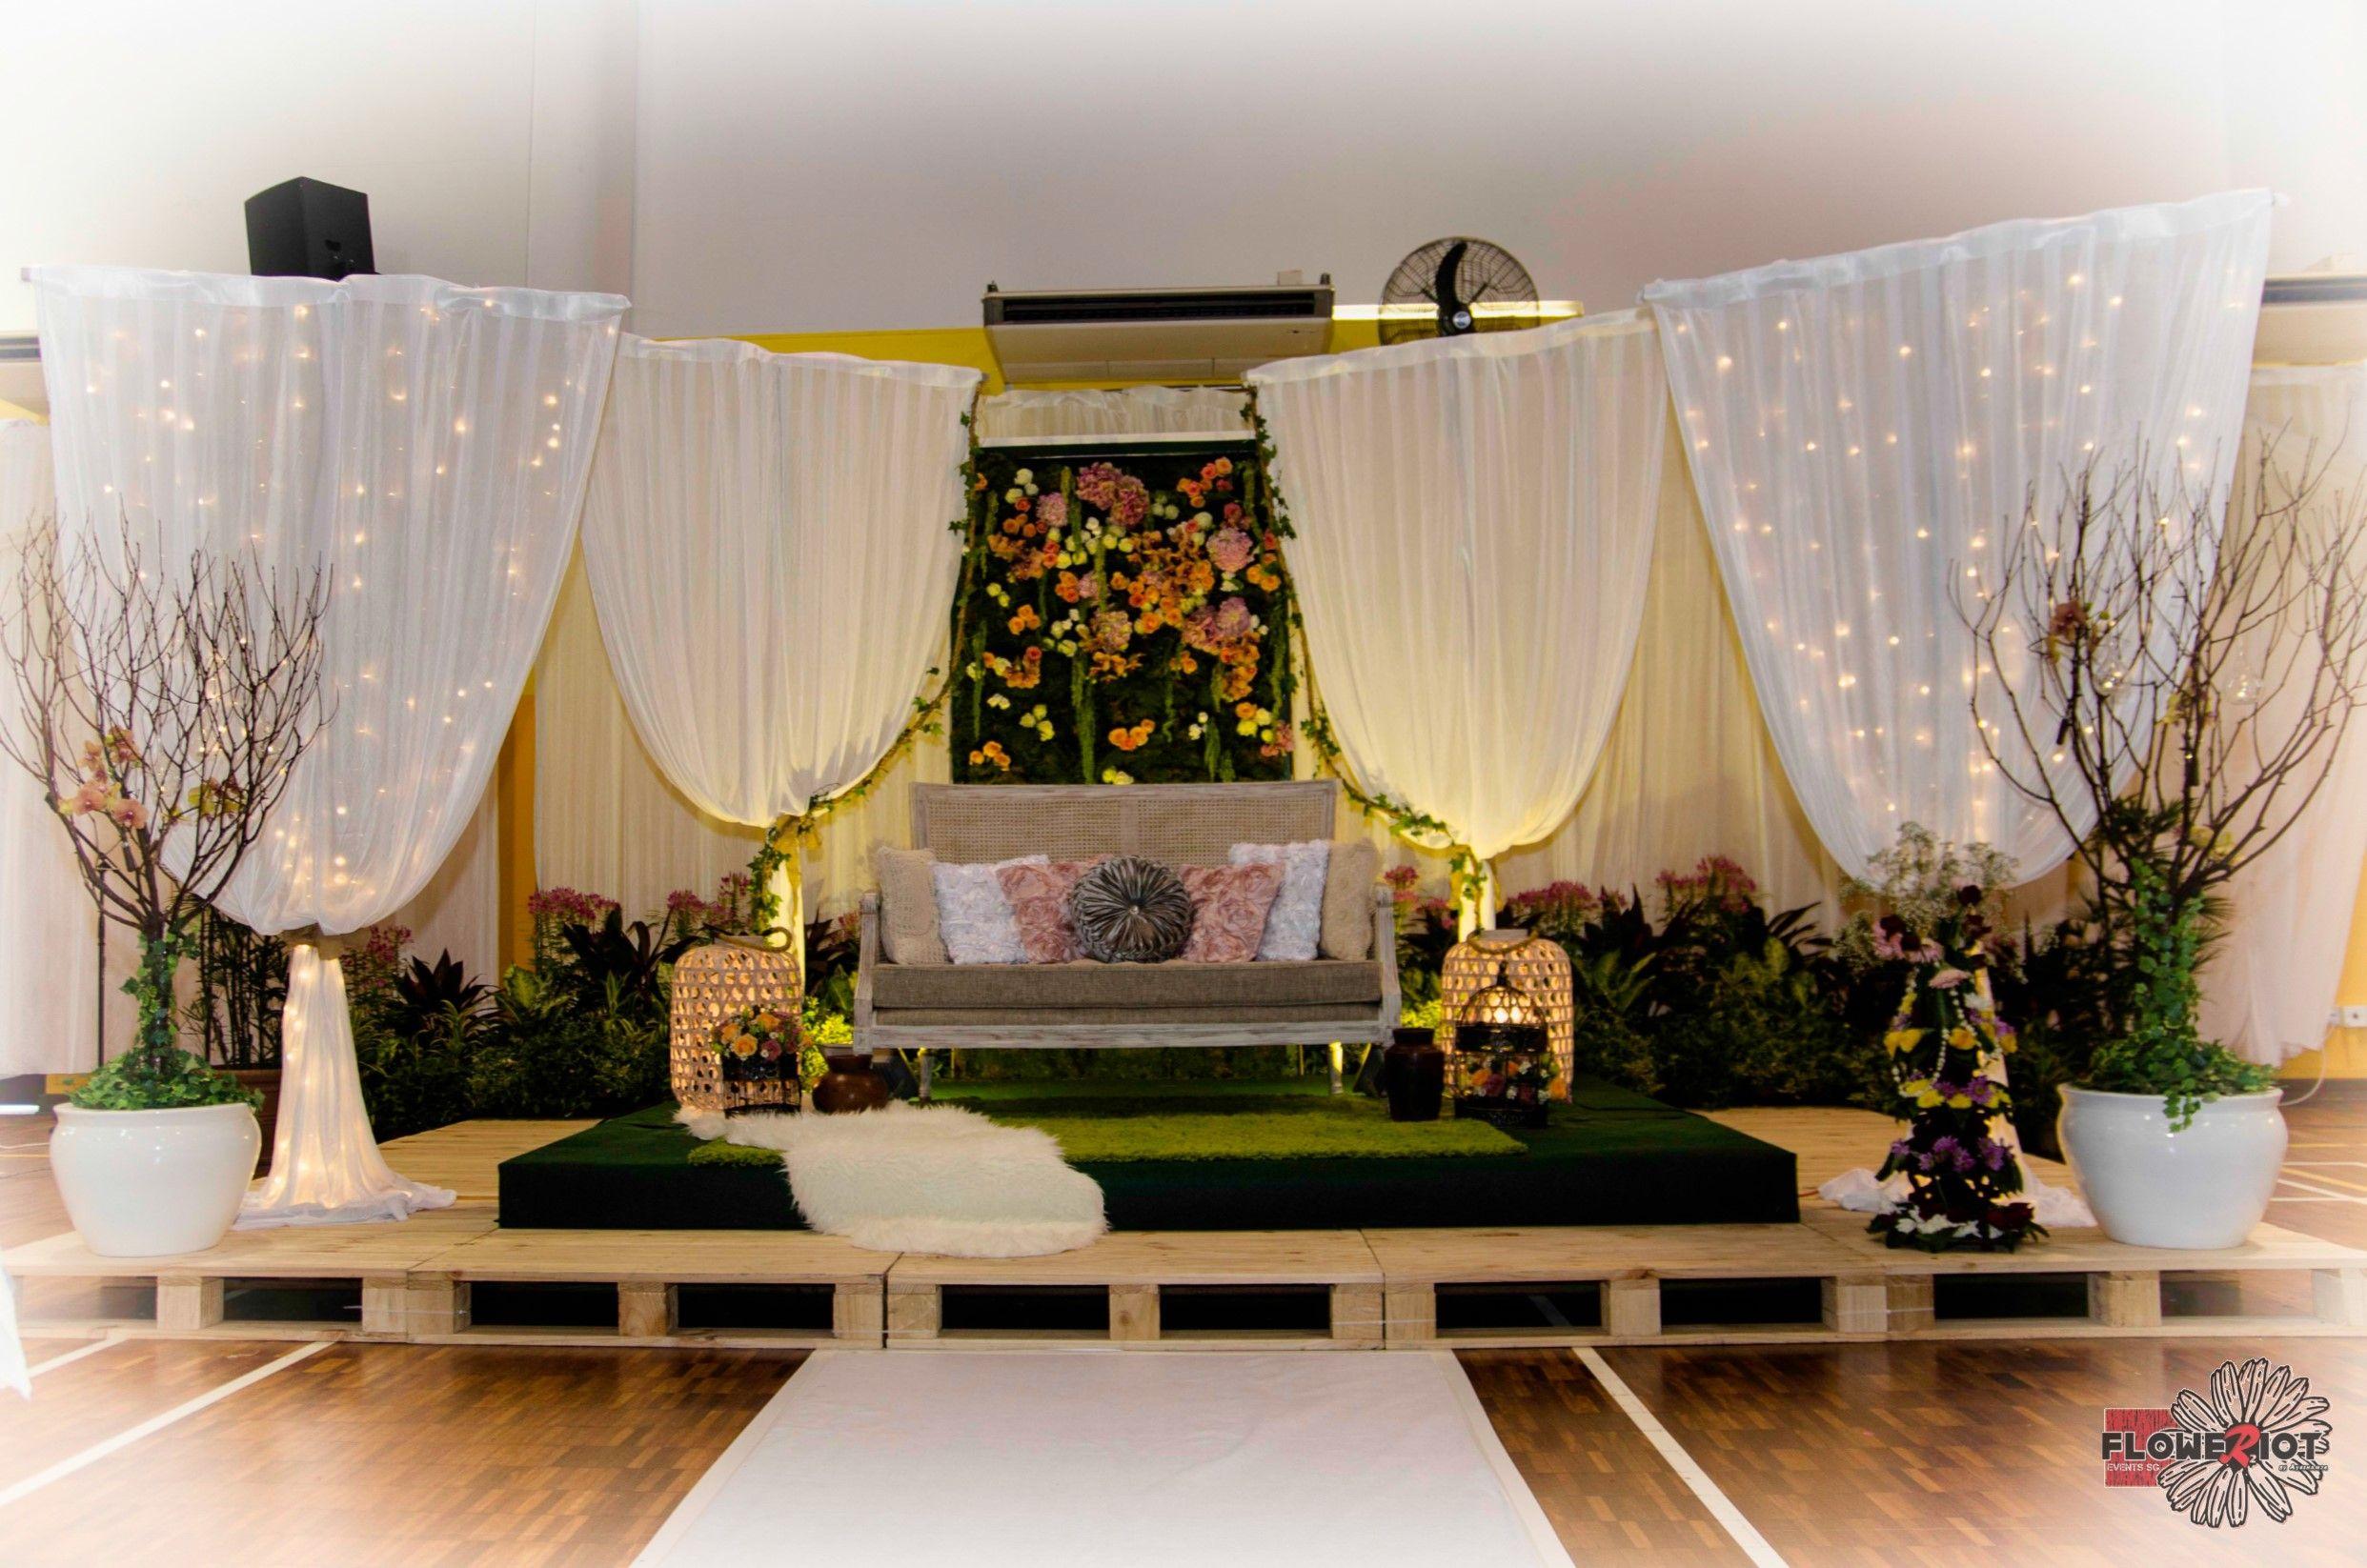 Flowerriot Events Sg Rustic Garden Wedding Flower Wall Rustic Wedding Decor